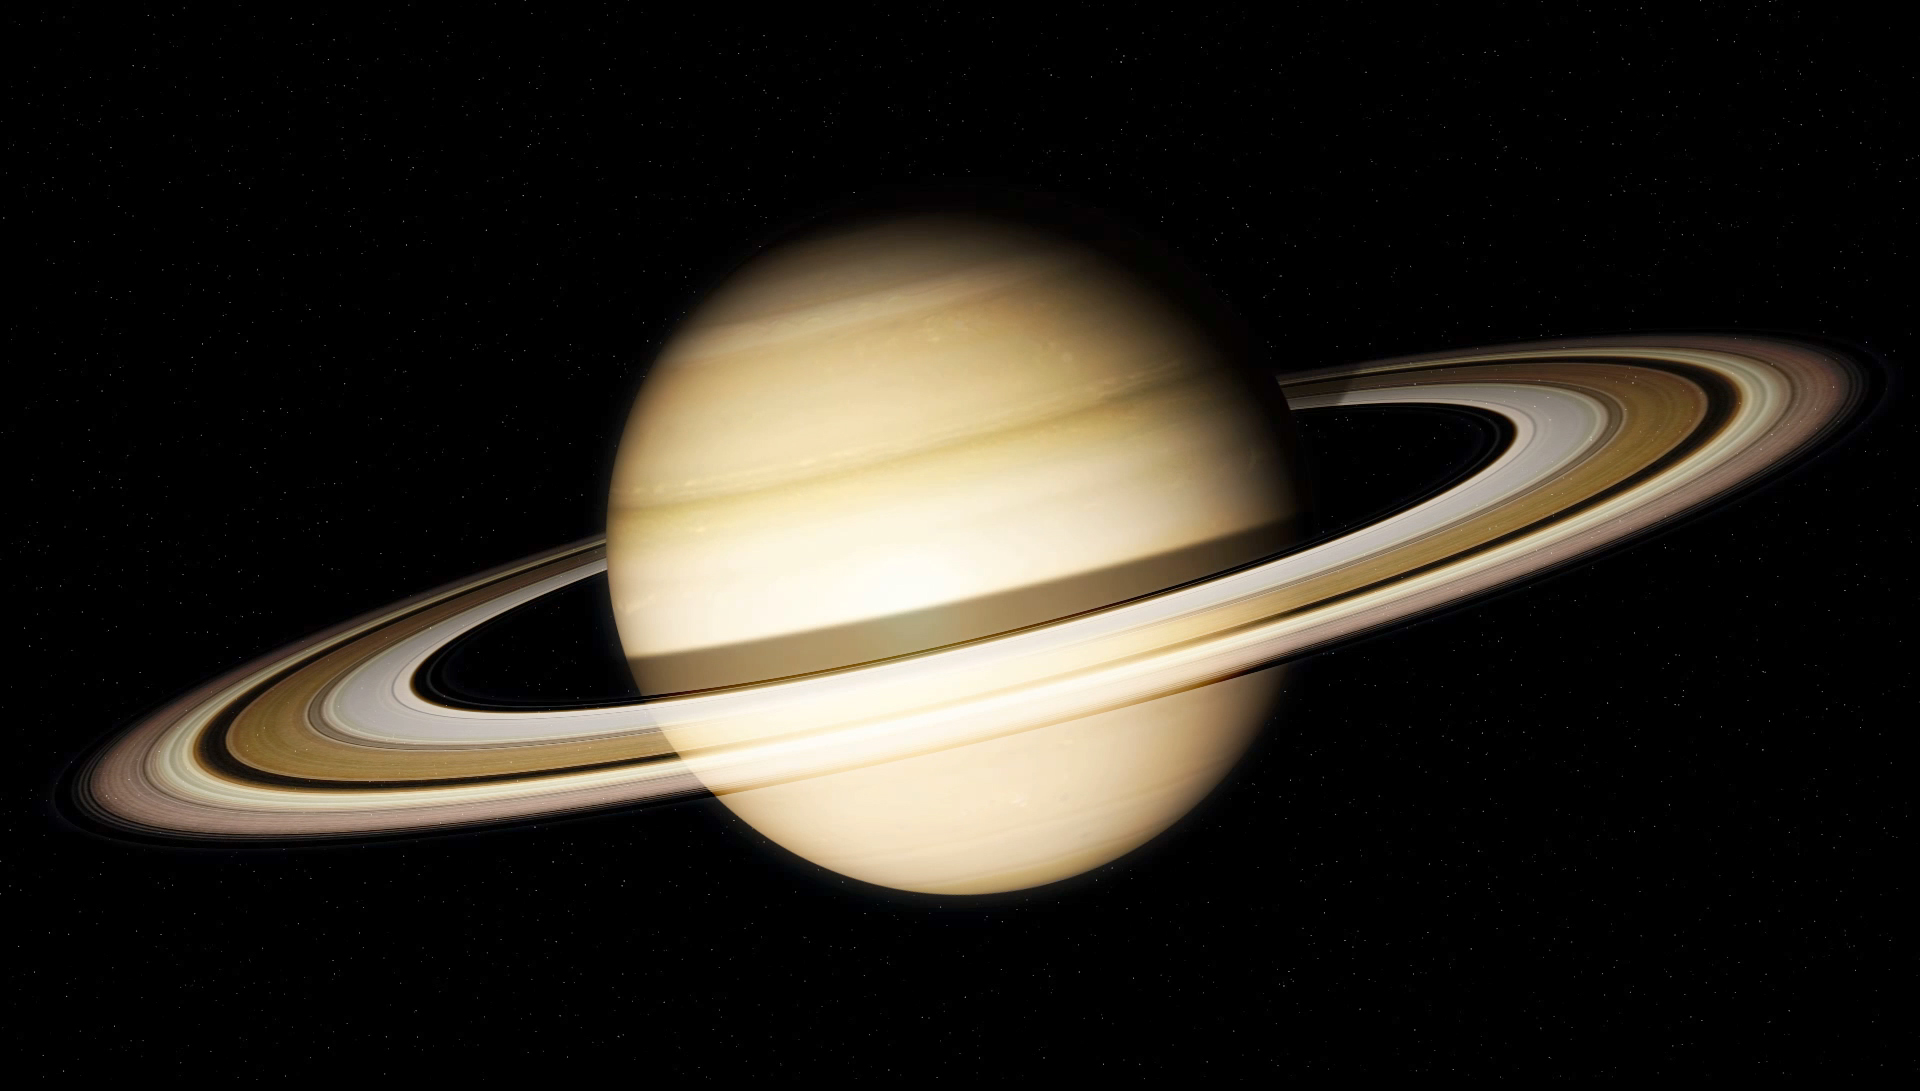 NASA опубликовало снимок Cassini тени Сатурна наего кольцах